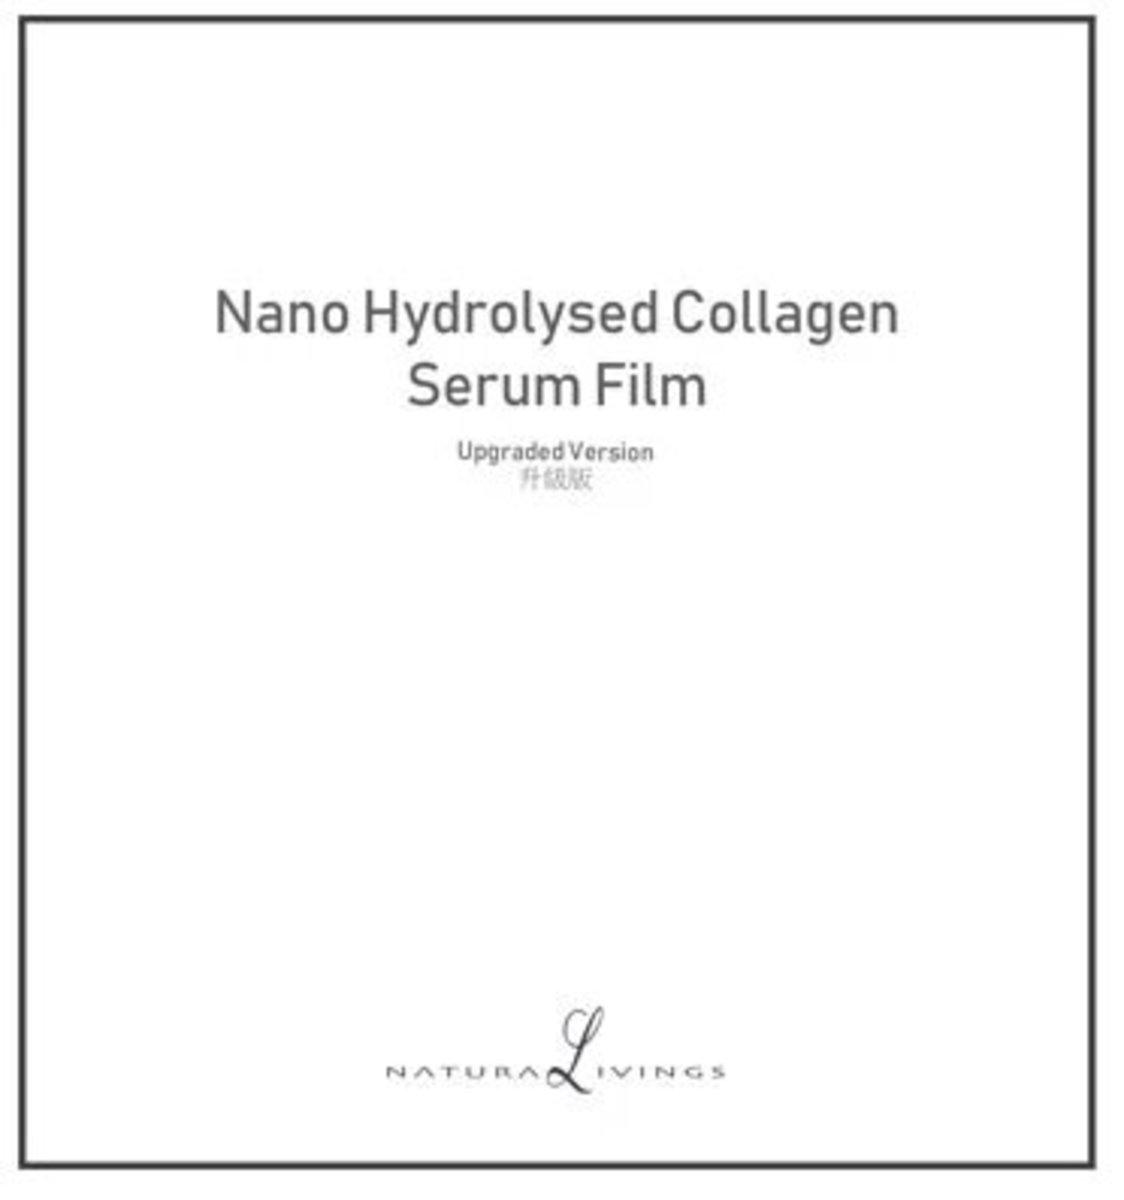 Nano Hydrolysed Collagen Serum Film (10 + 4pcs)